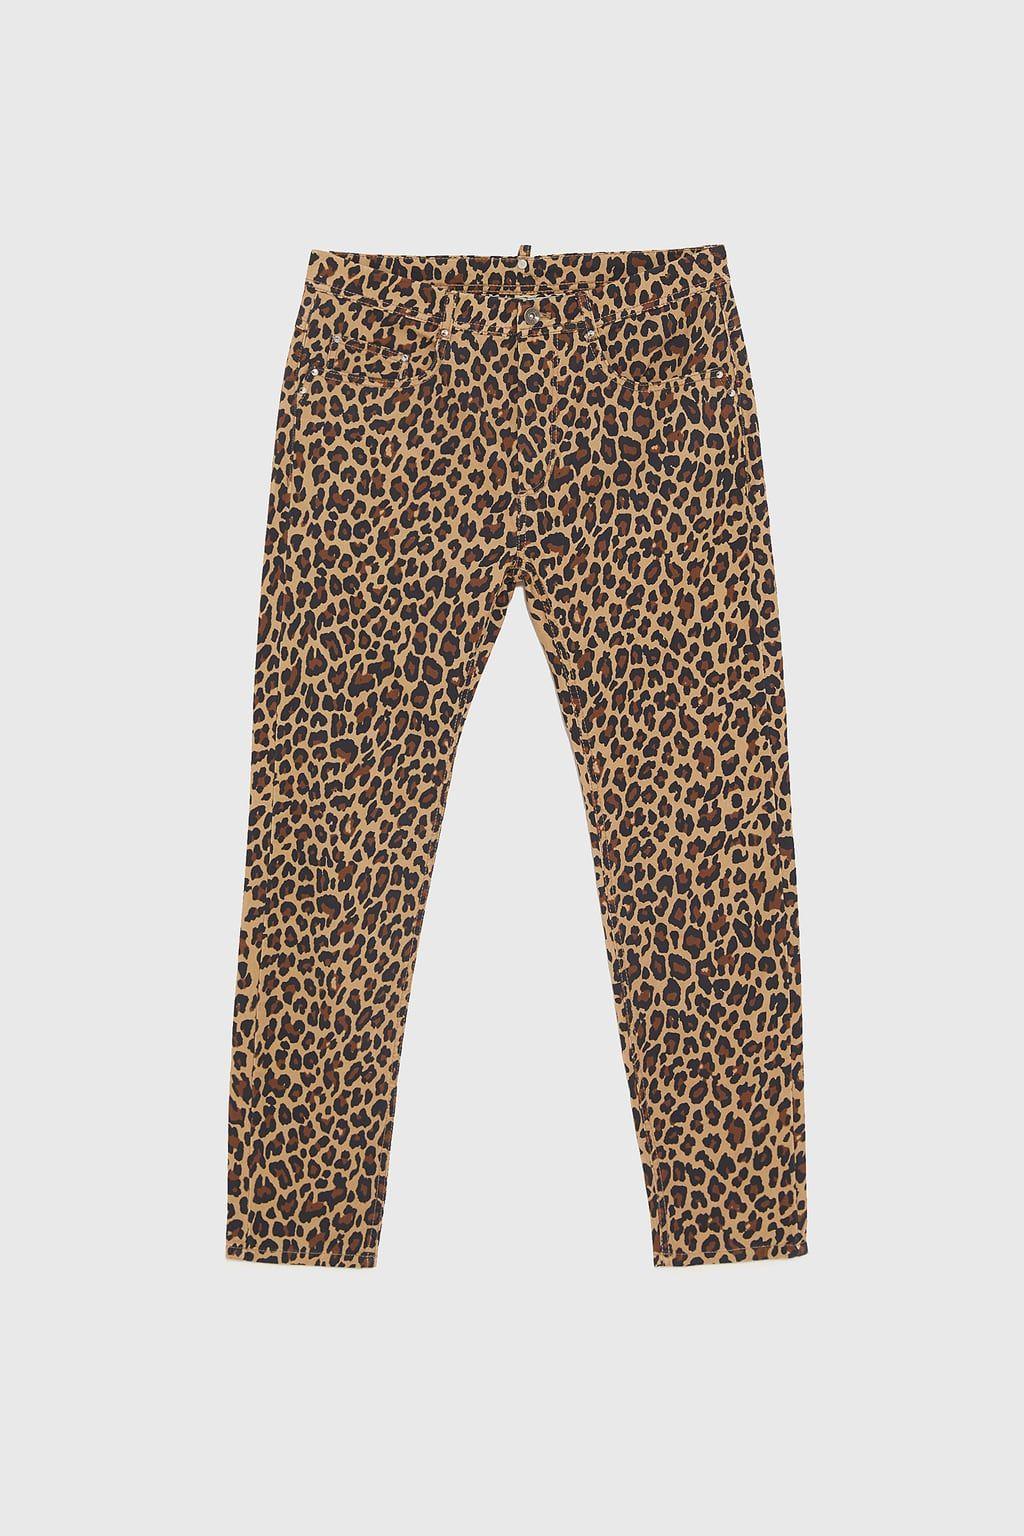 Imagen 6 De Pantalon Estampado Animal De Zara Animal Print Pants Skinny Pants Printed Pants